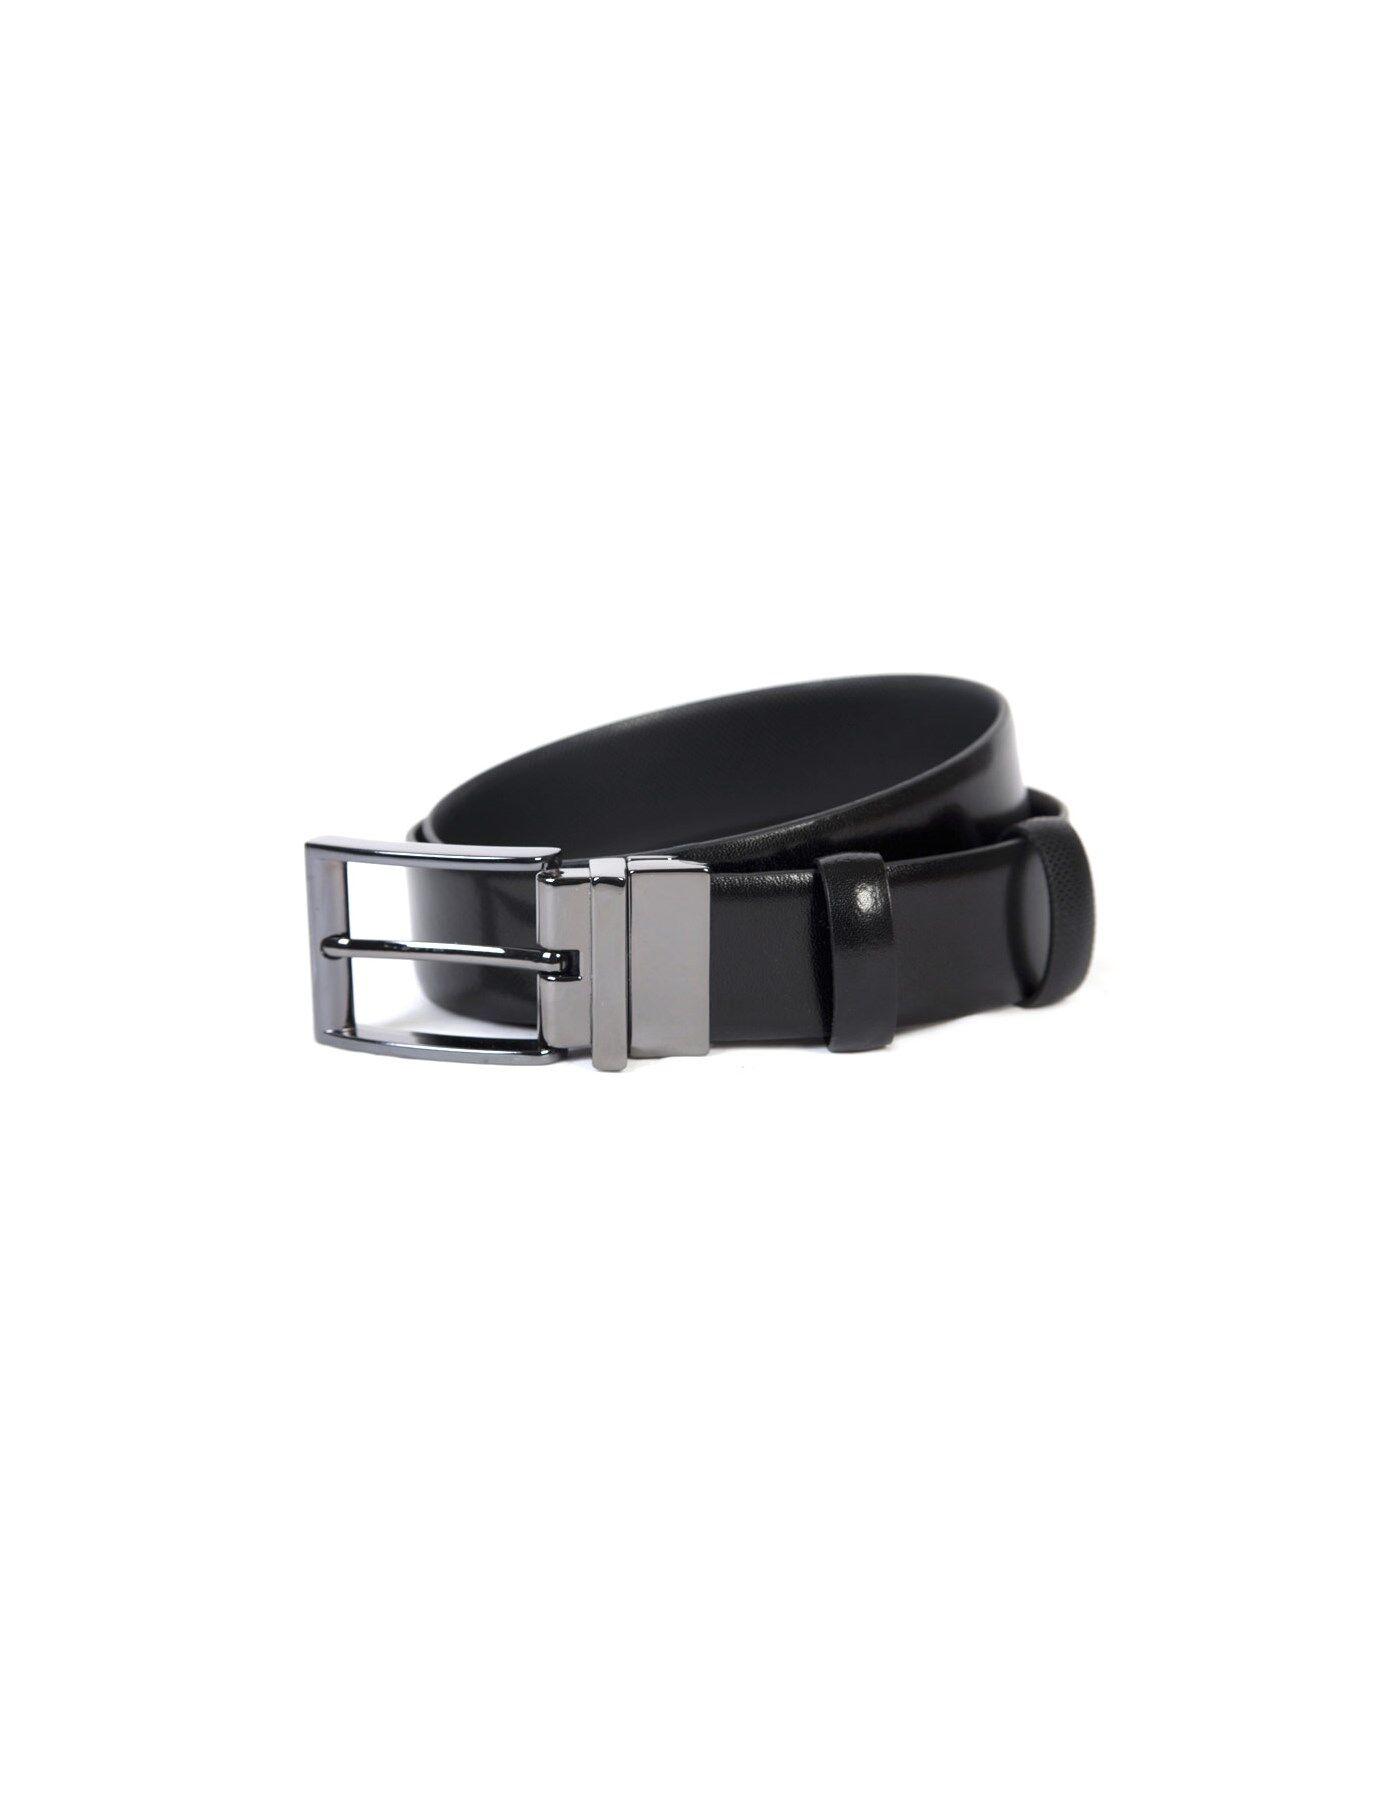 Hawes & Curtis Men's Textured Reversible Leather Belt in Black Medium